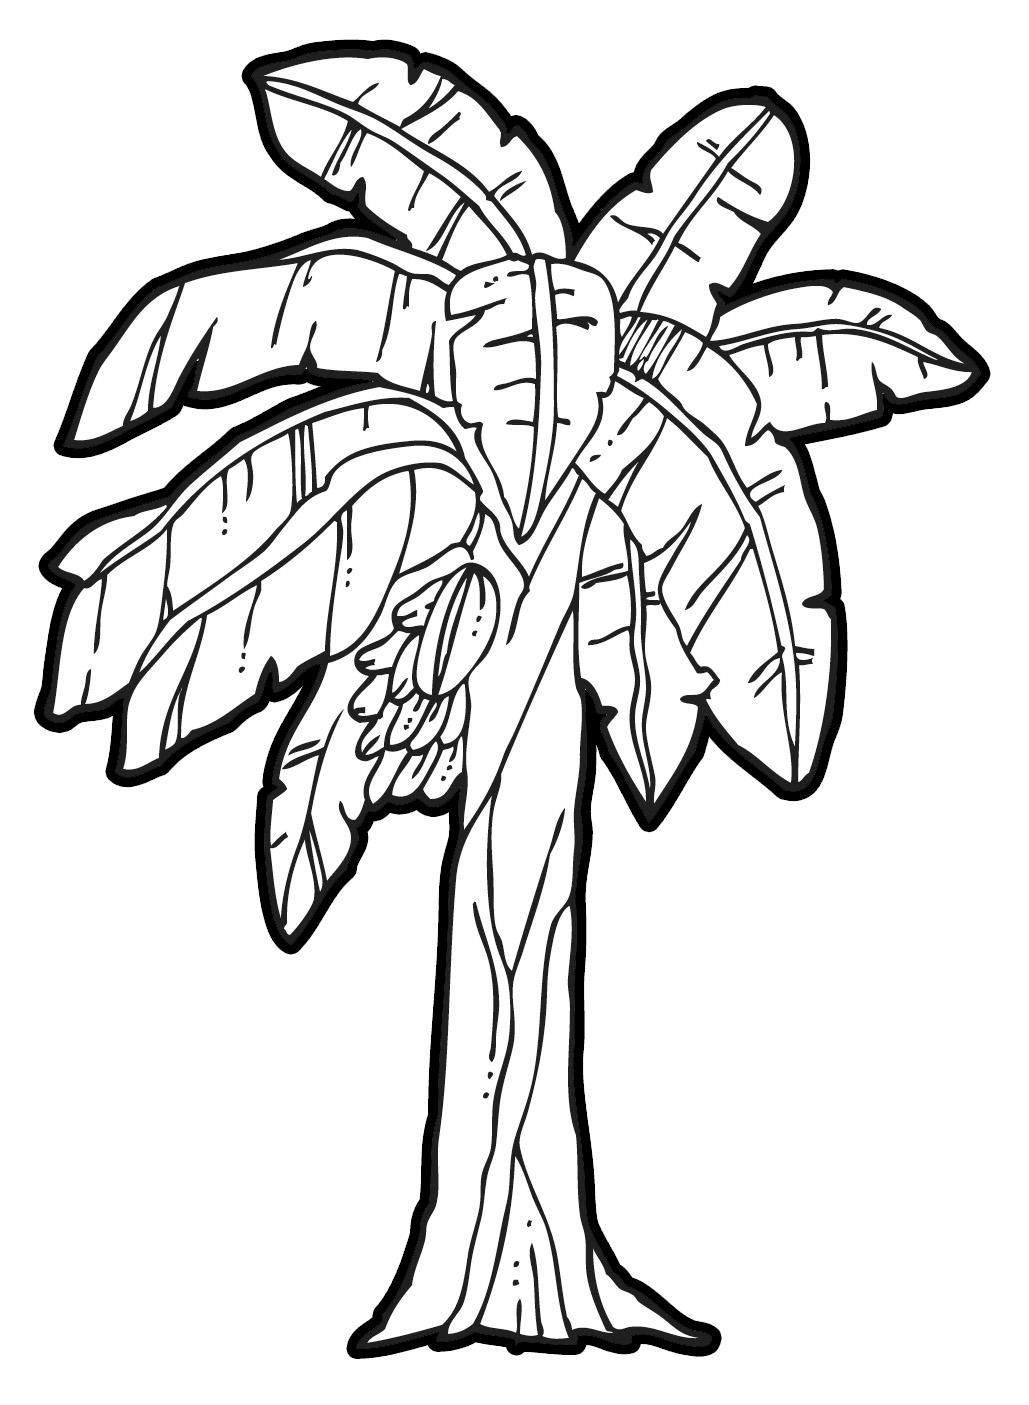 1029x1405 Tree Line Drawing Clip Art